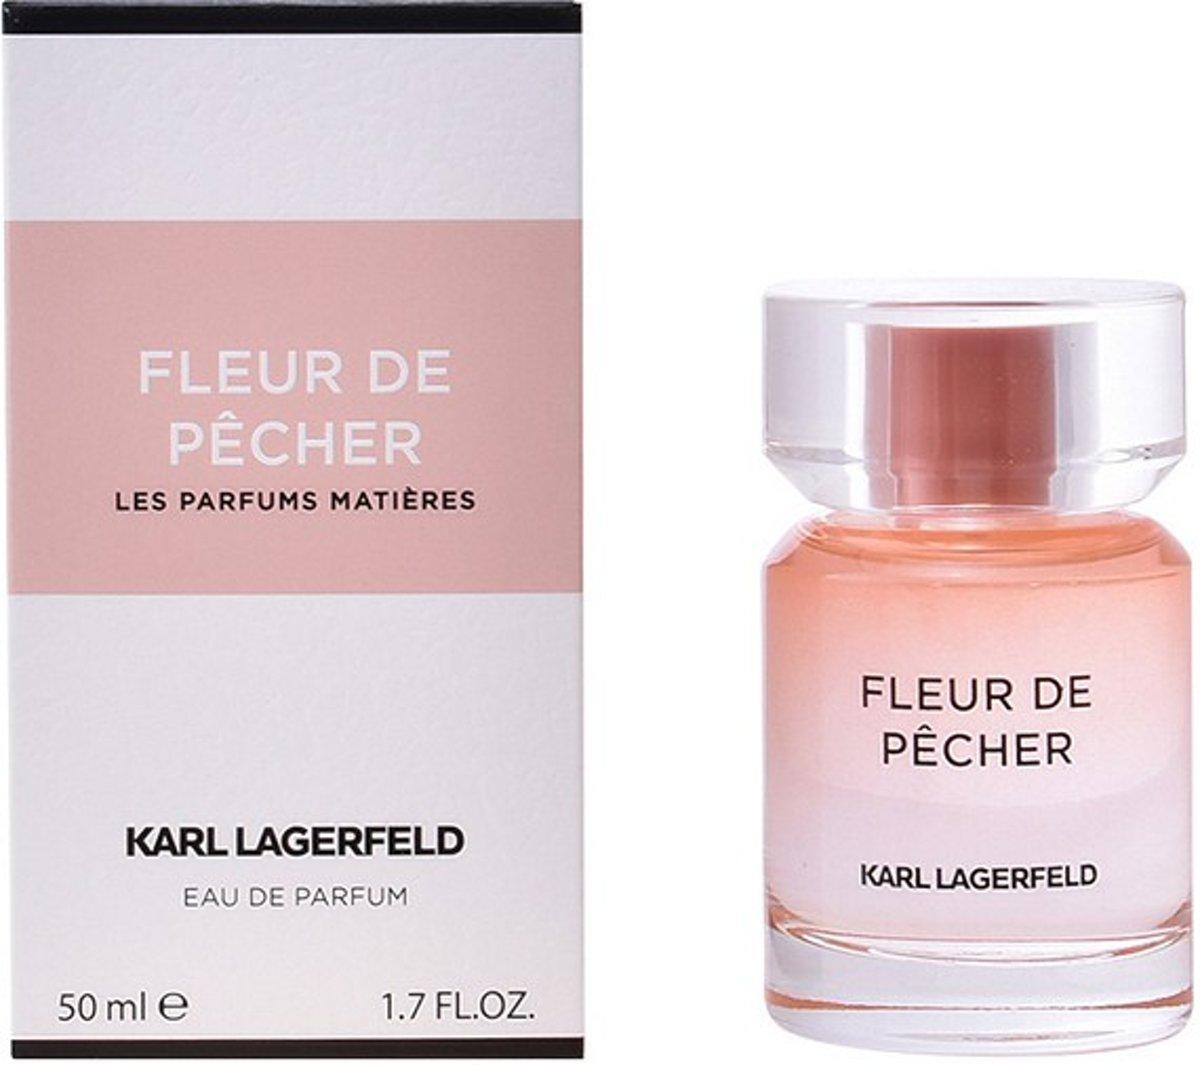 Bol Com Karl Lagerfeld Fleur De Pecher Eau De Parfum Spray 50 Ml